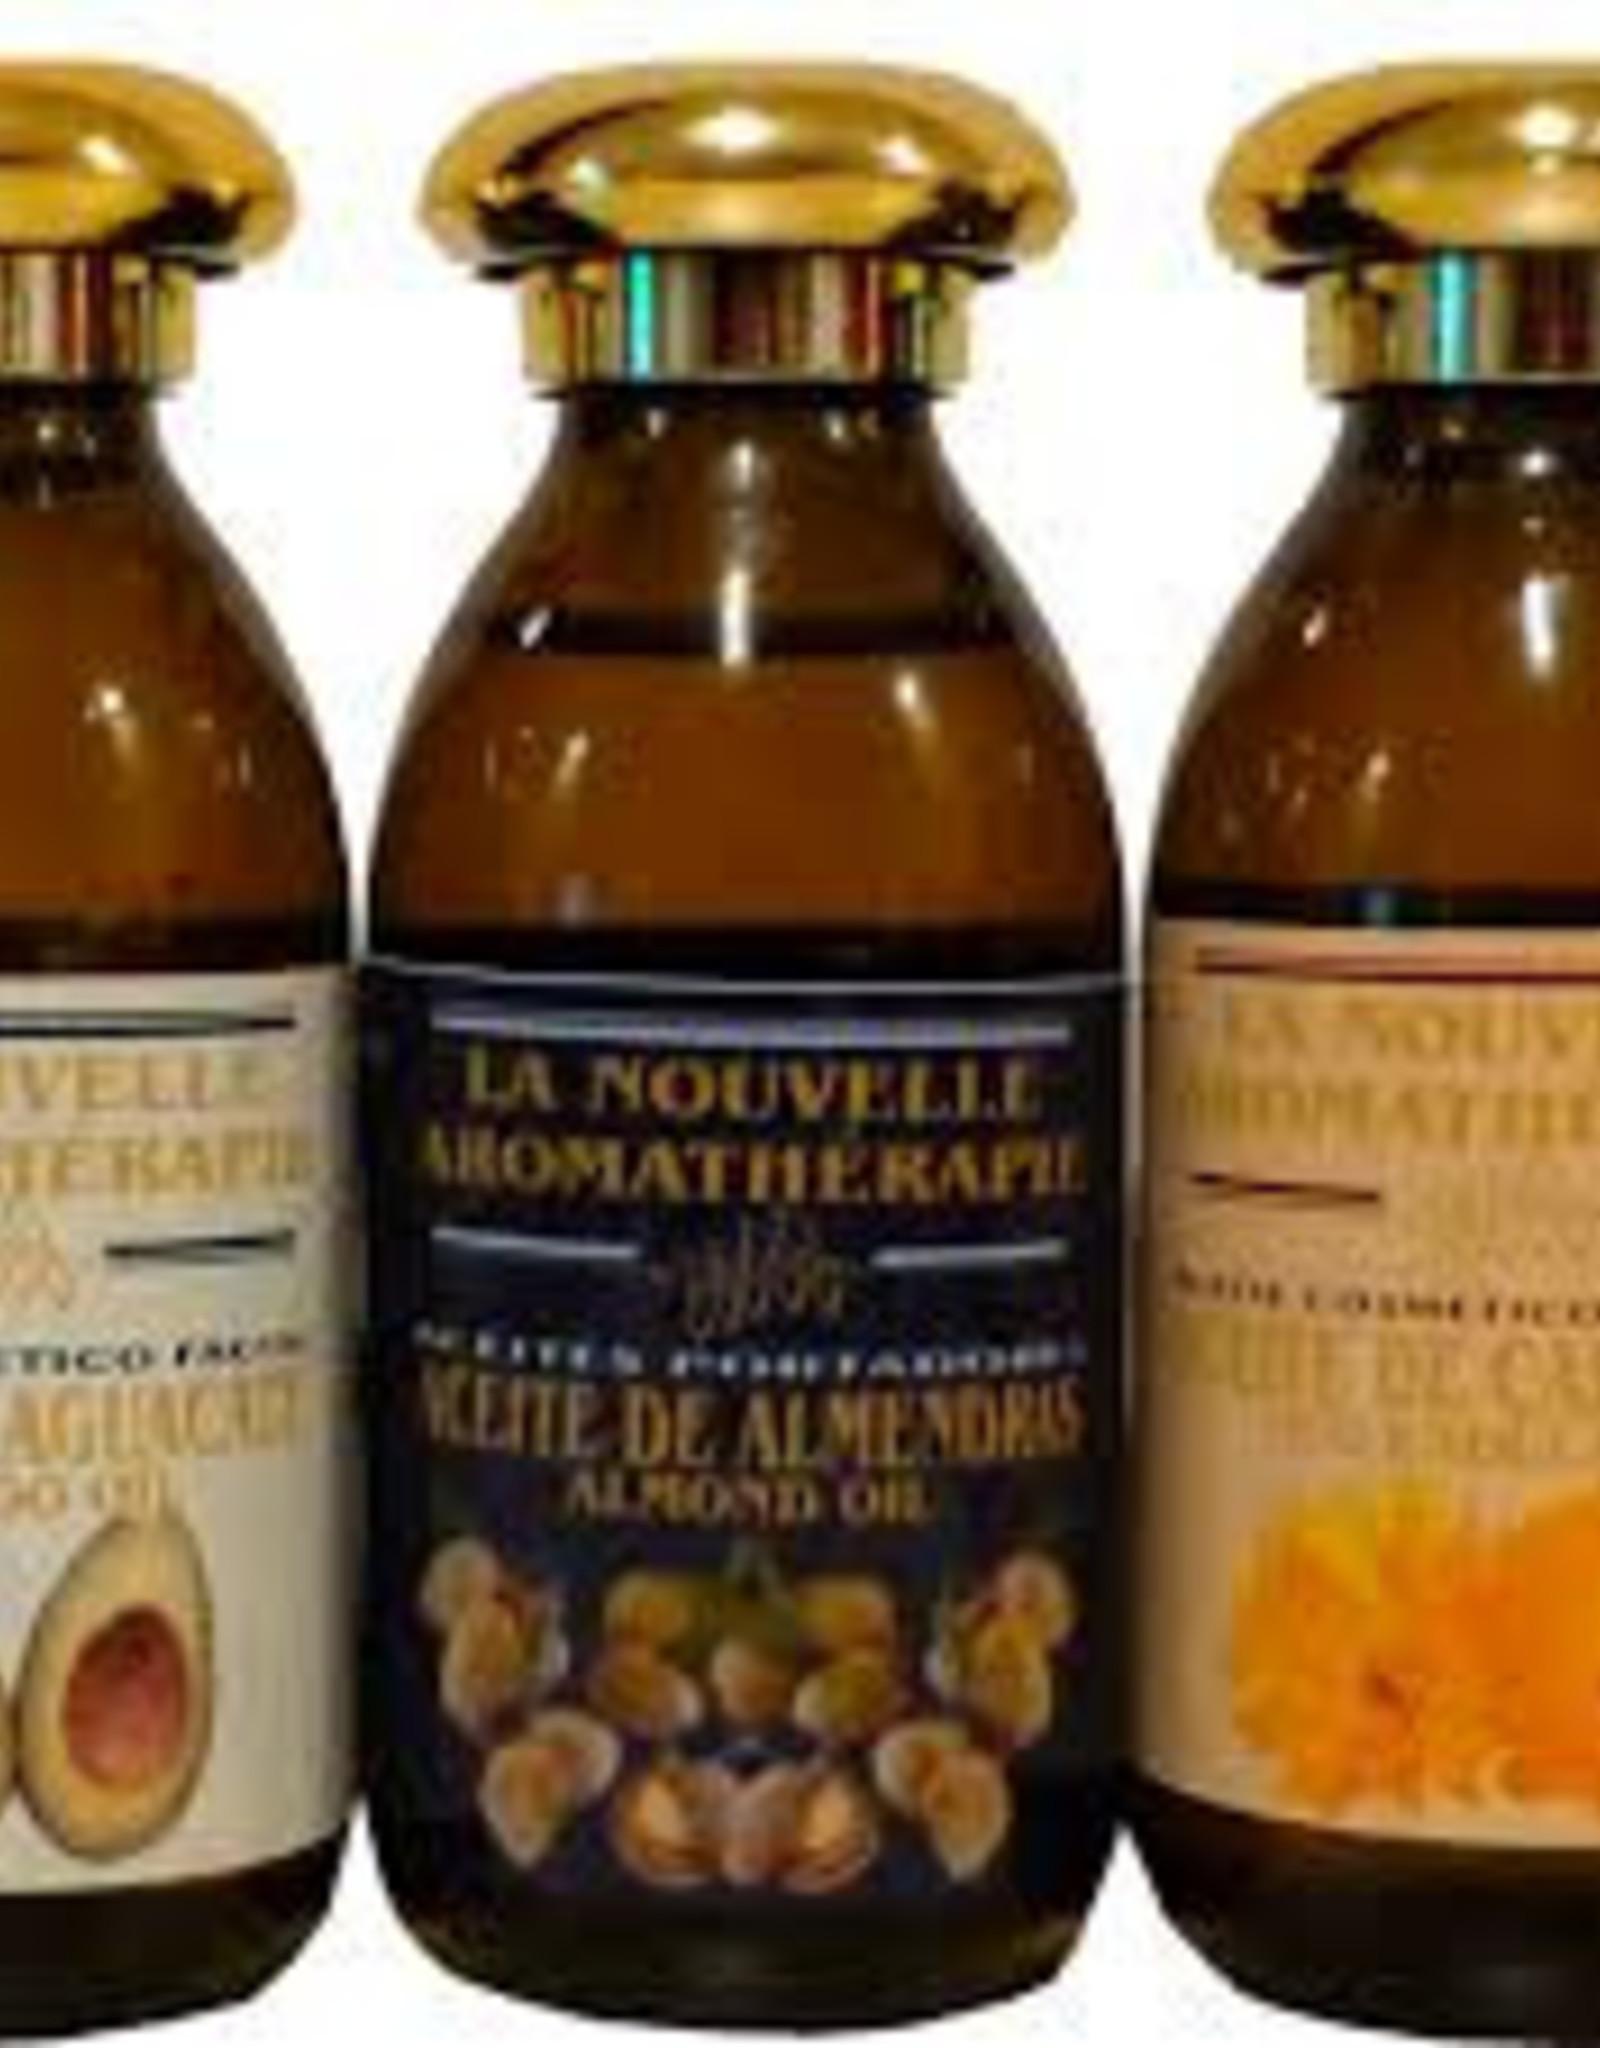 Utsukusy Almond oil